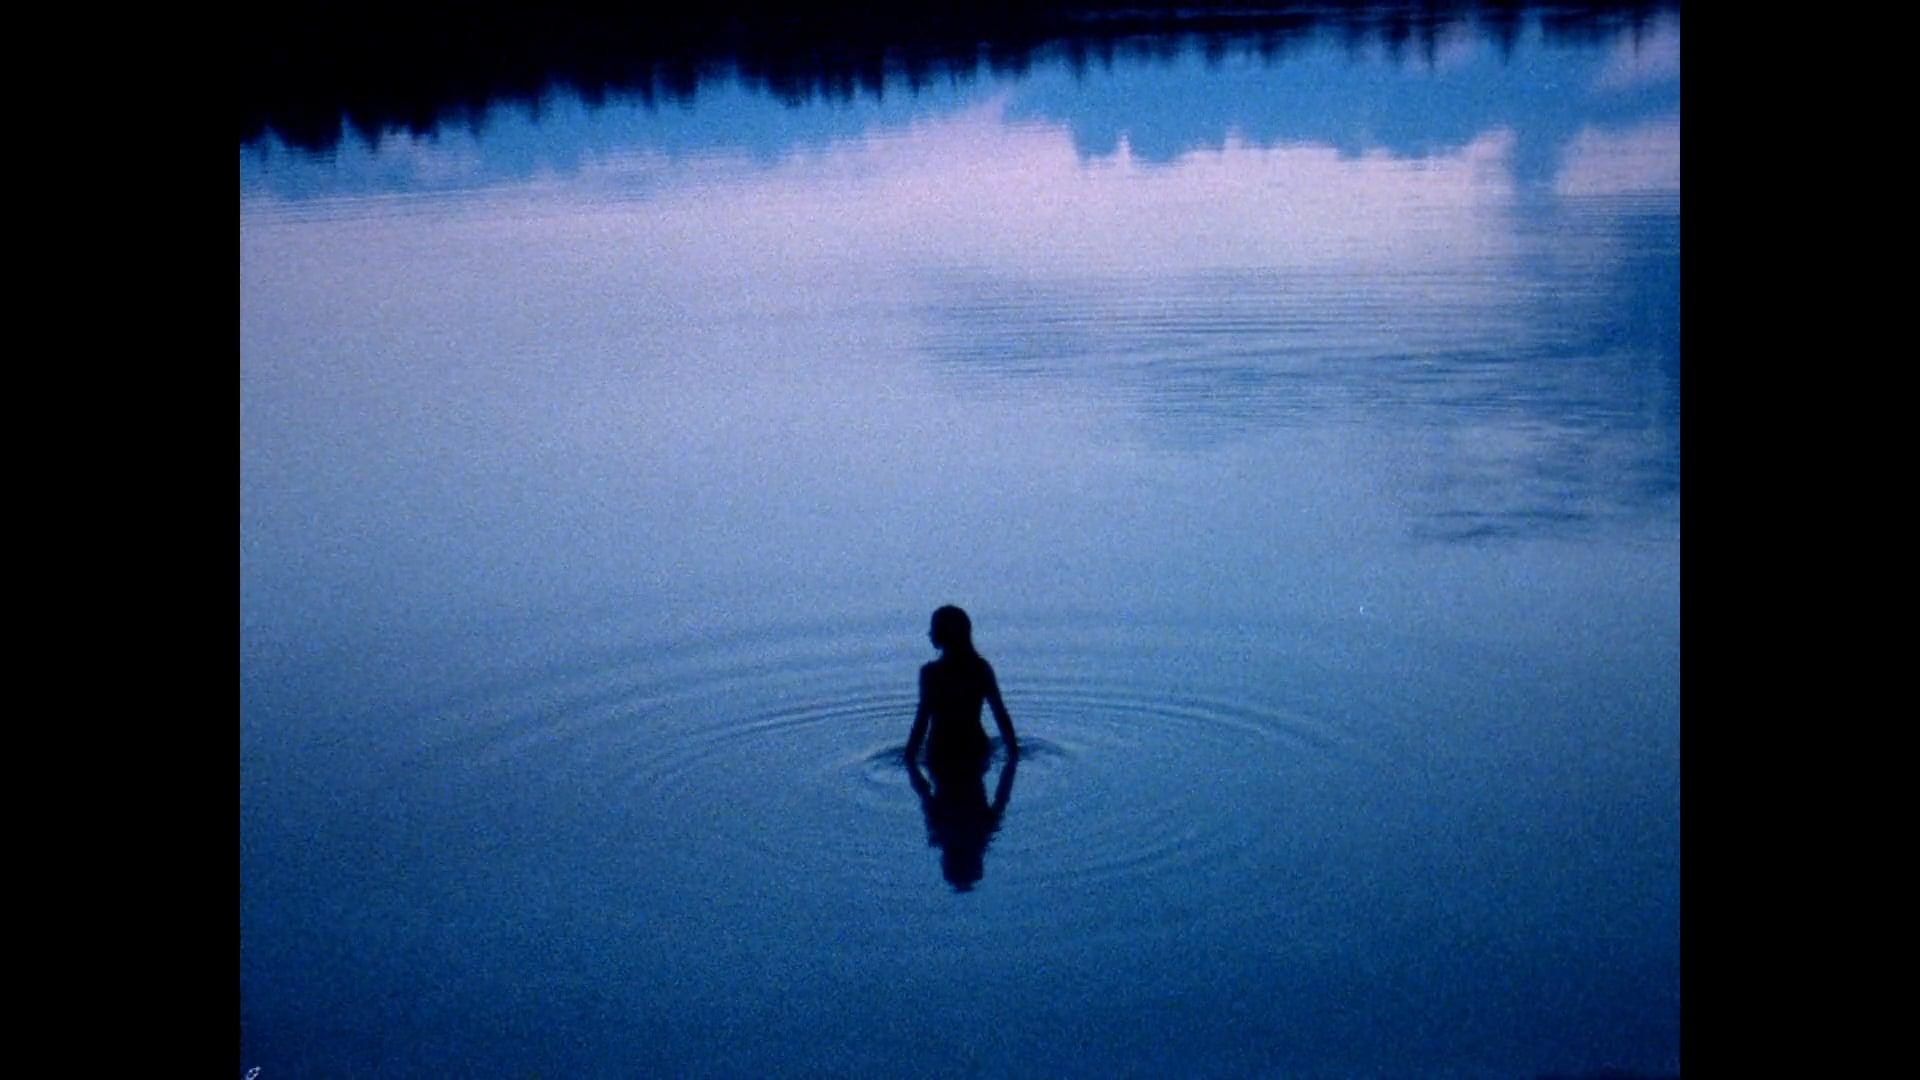 JASMINE KARIMOVA - CHECK THE WATERS